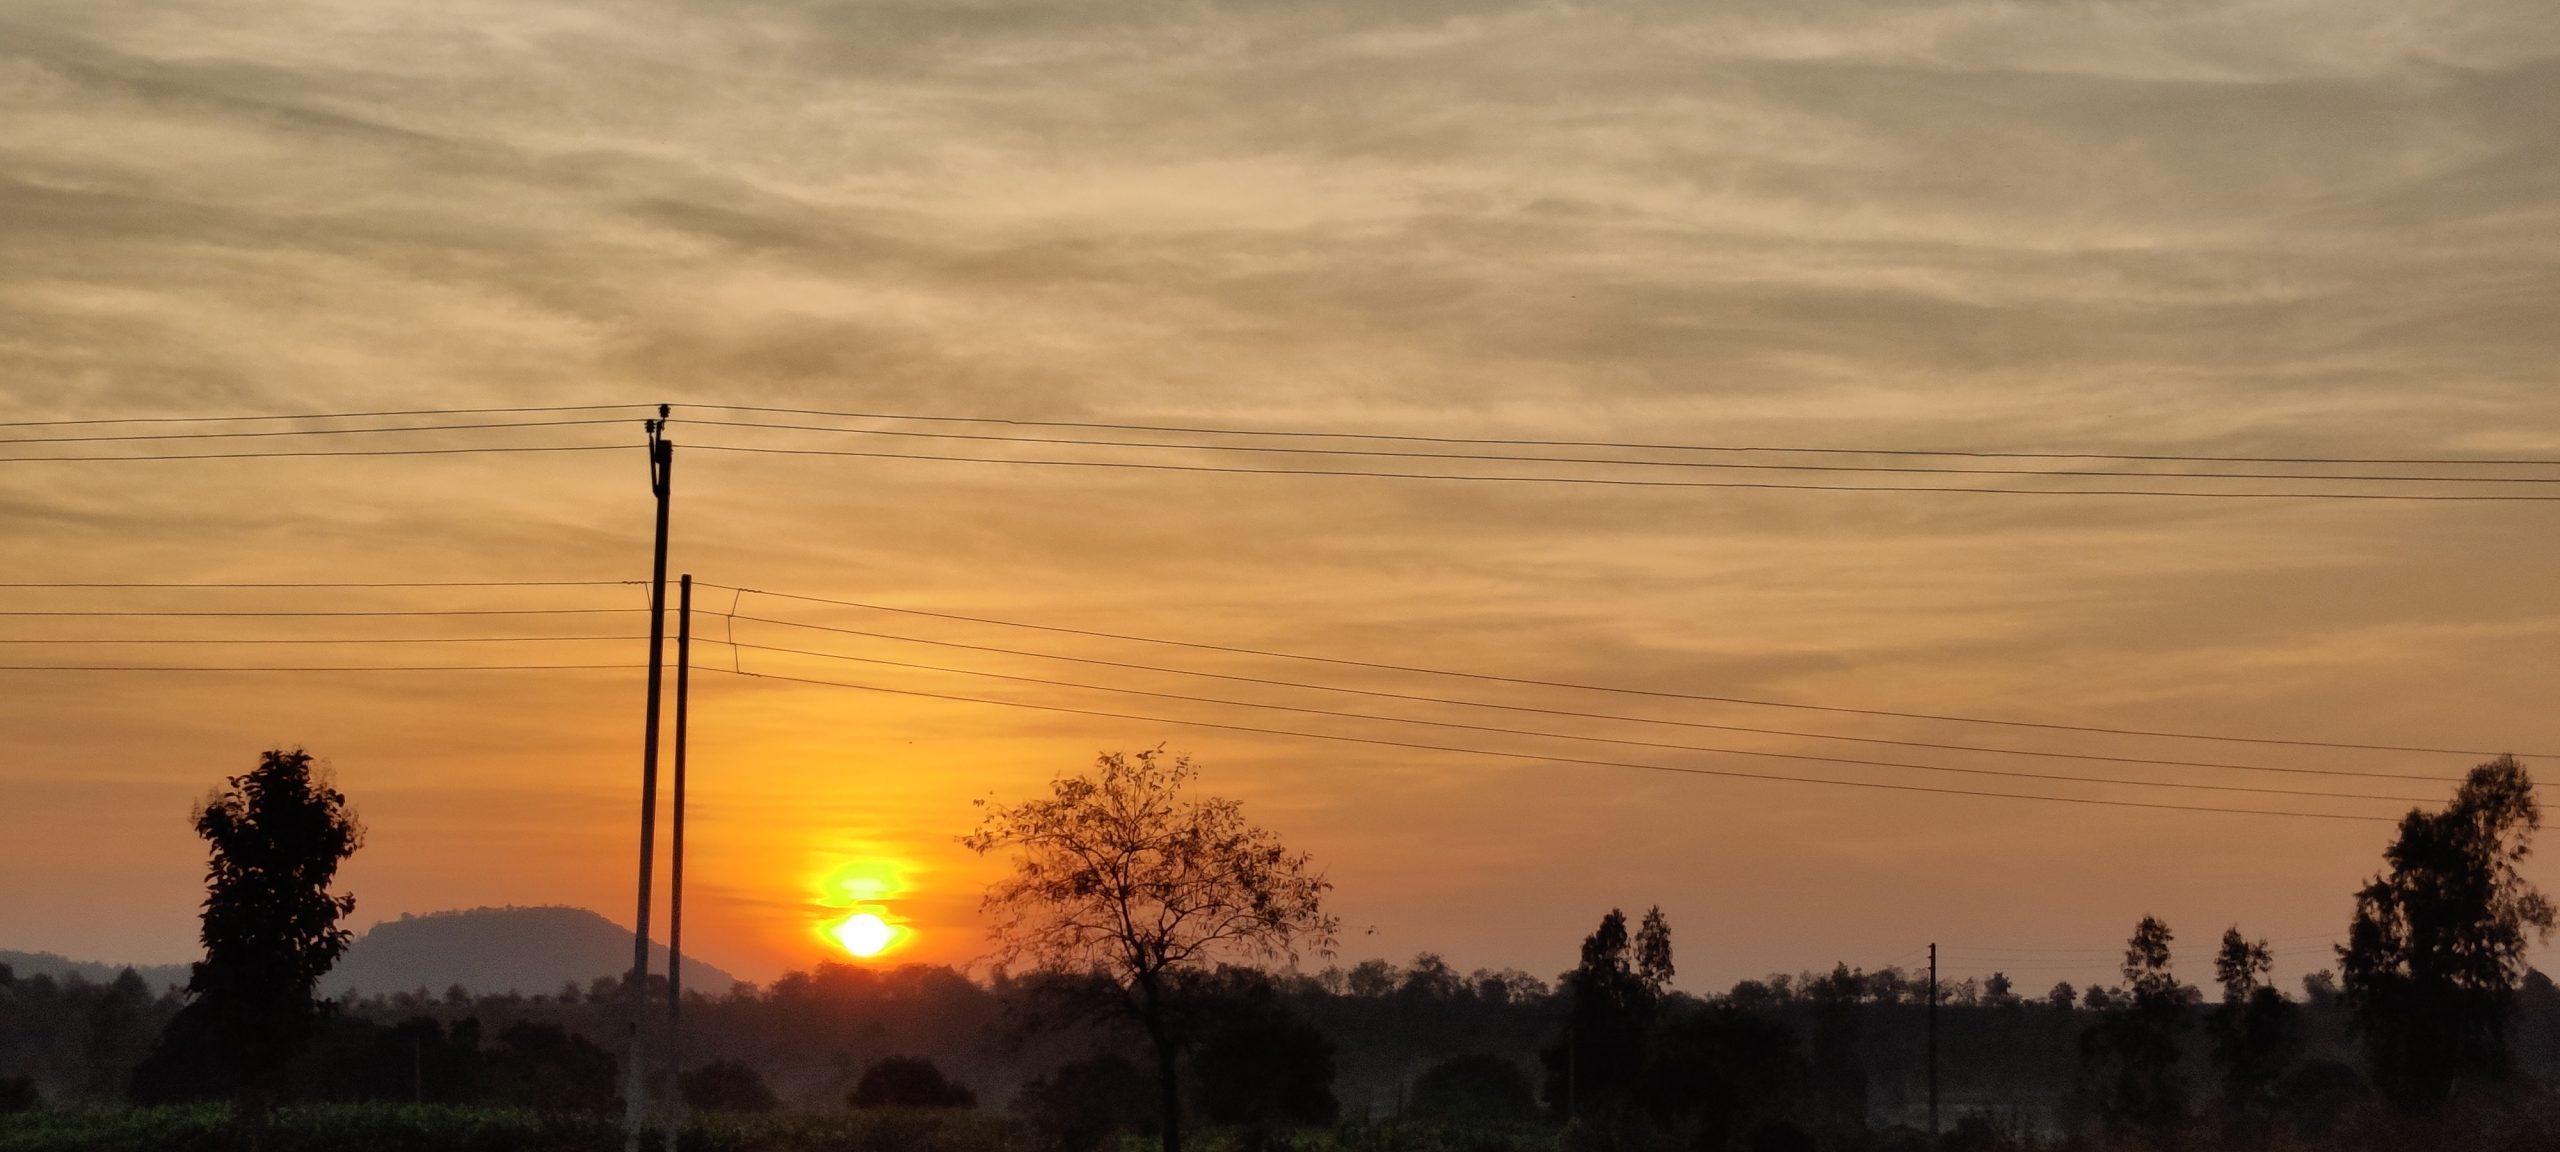 A sunrise view